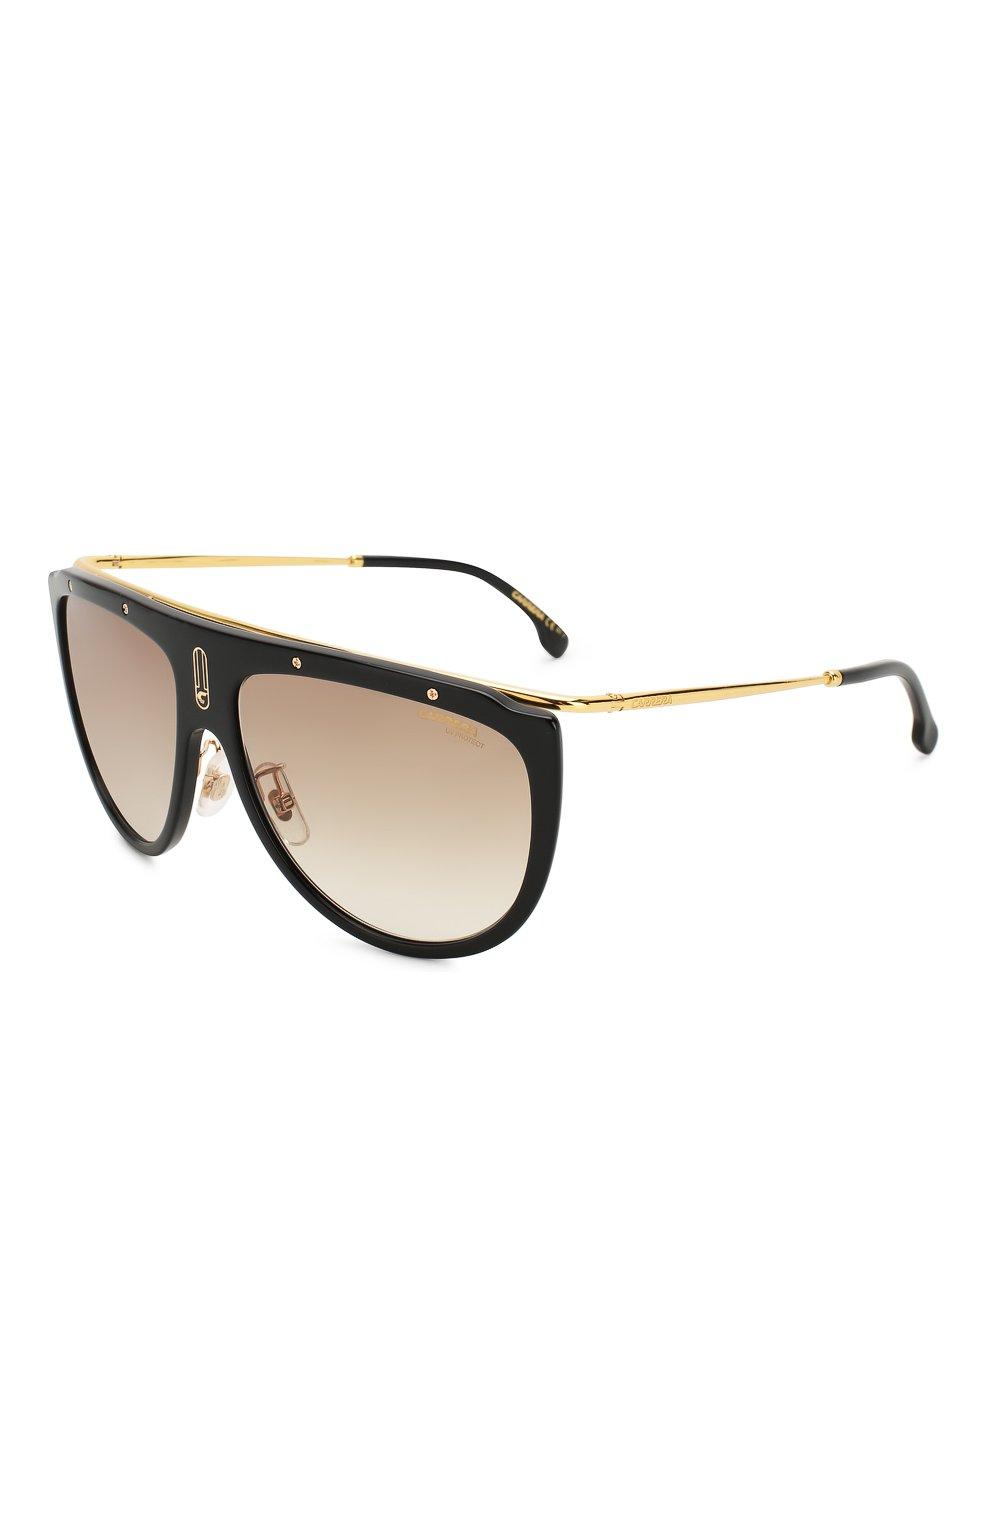 Женские солнцезащитные очки CARRERA коричневого цвета, арт. CARRERA 1023 2M2   Фото 1 (Тип очков: С/з; Статус проверки: Проверено, Проверена категория; Очки форма: Маска, D-форма; Оптика Гендер: оптика-унисекс)